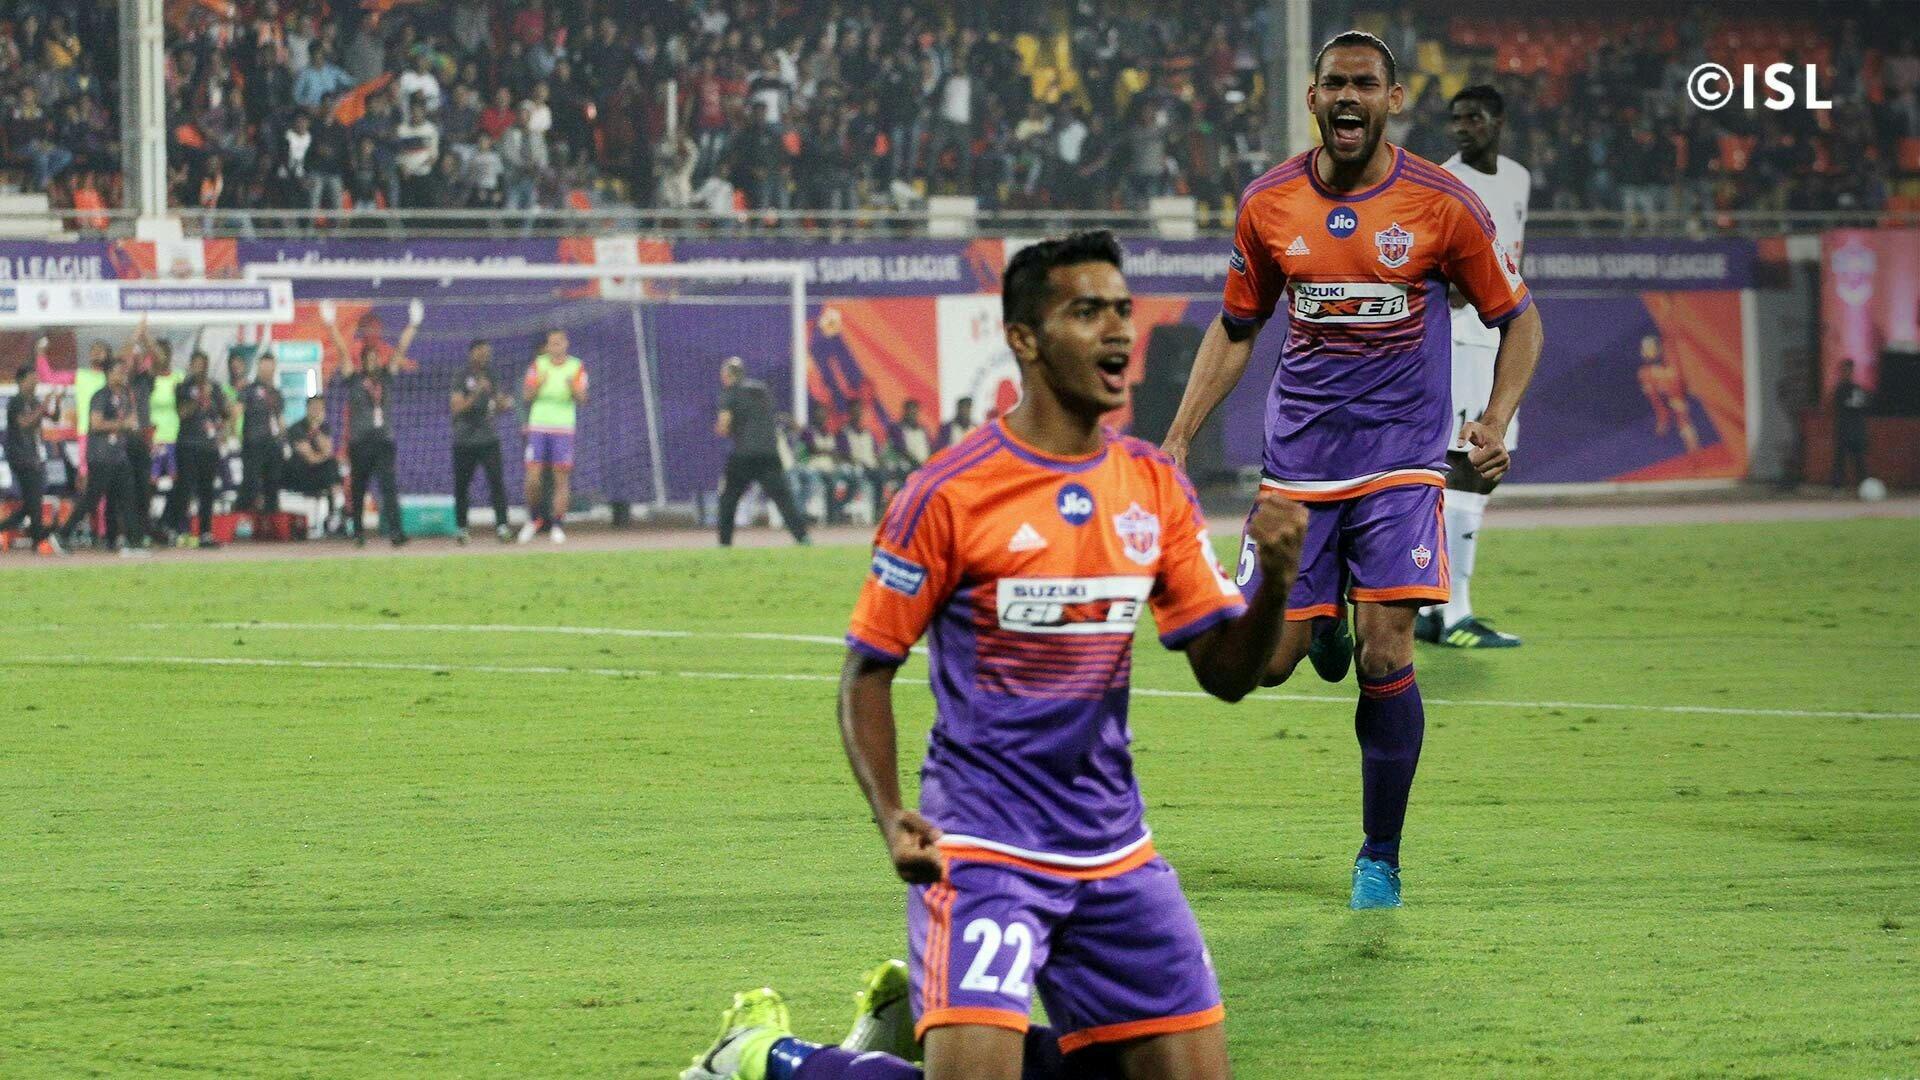 Bengaluru FC in advanced talks with FC Pune City winger bwdojiqd8t117334586 1